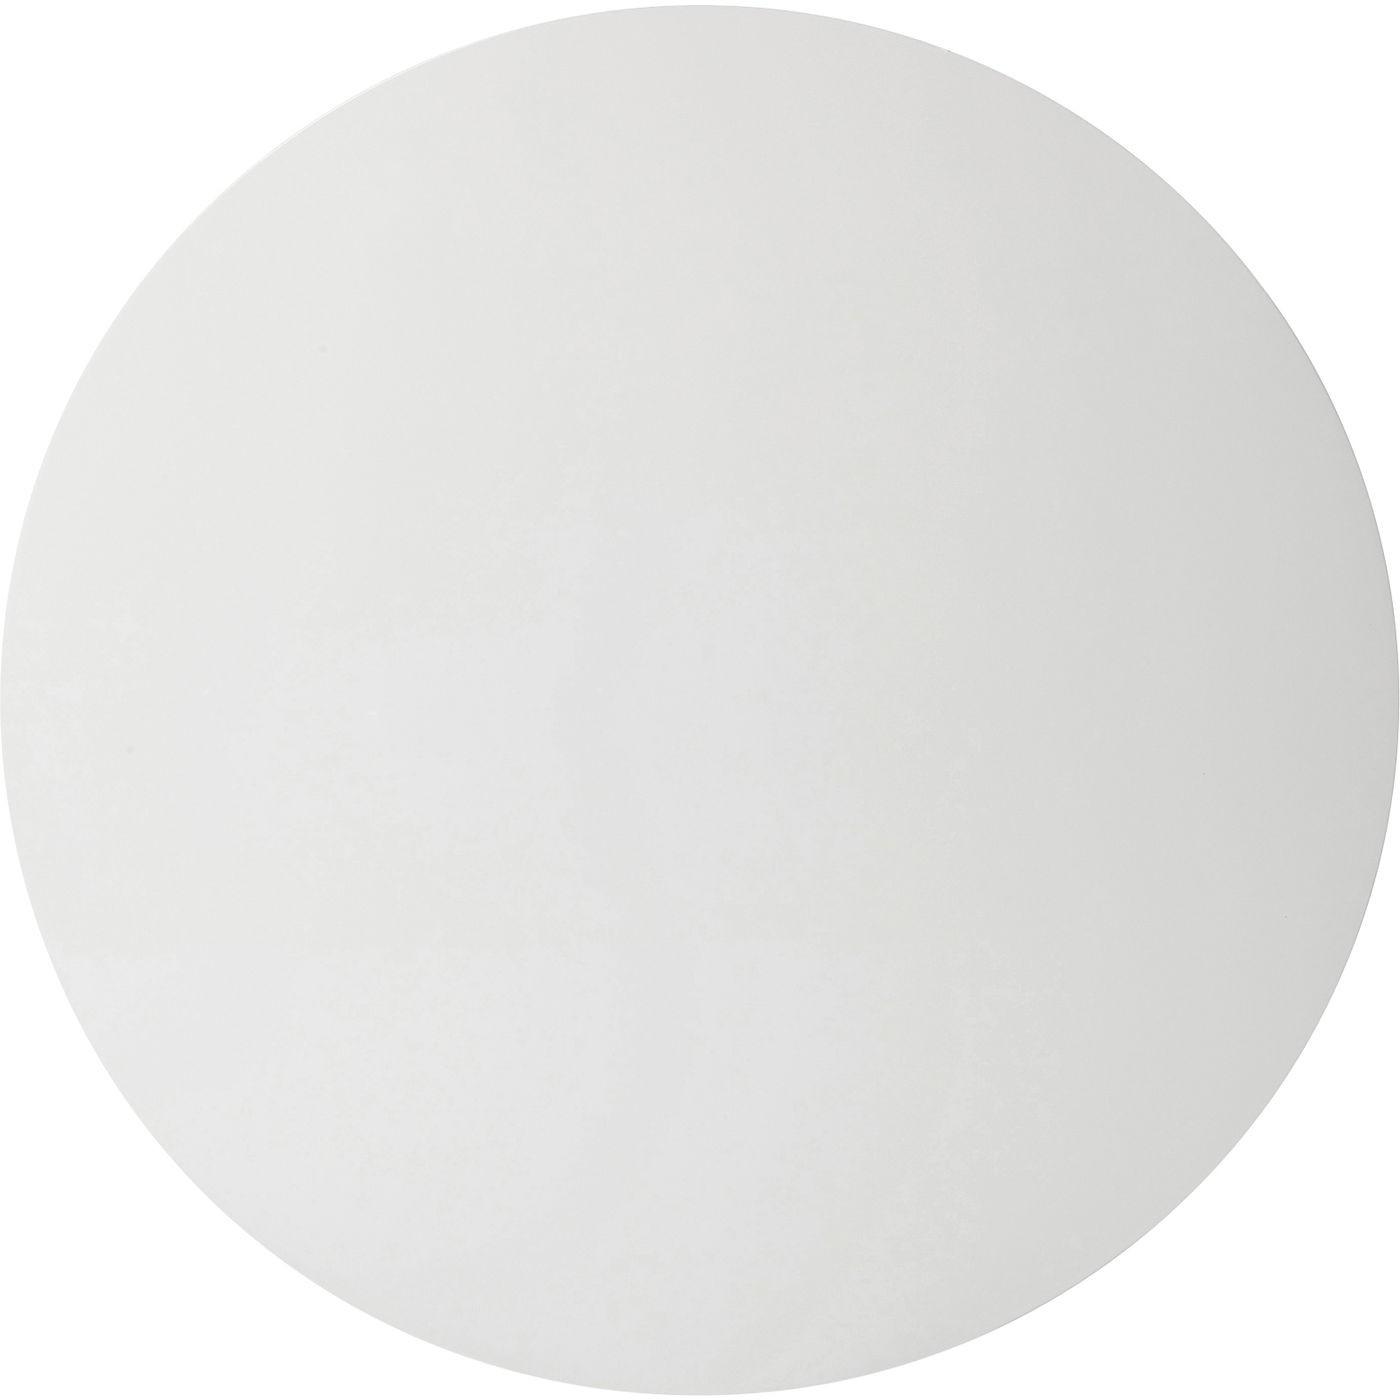 Table Invitation blanche & dorée Kare Design Diamètre - 120cm